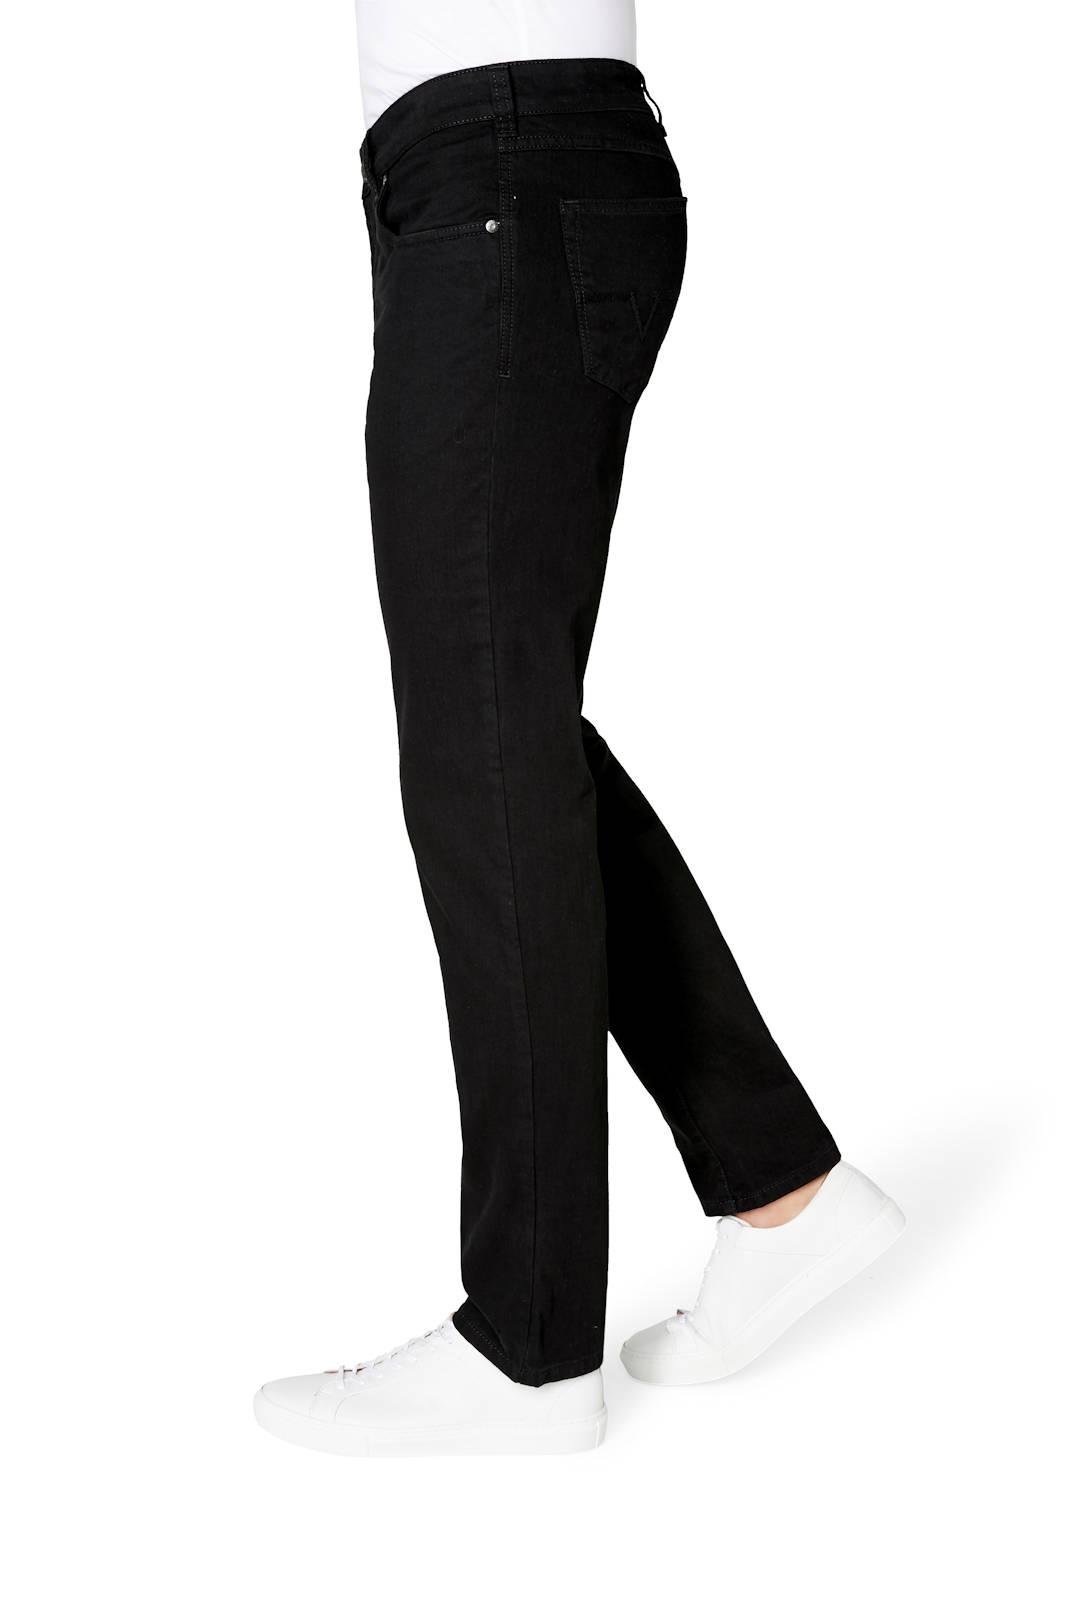 Atelier-GARDEUR-Jeans-NEVIO-11-Regular-Fit-Herren-Hose-Straight-Leg-Denim-NEU Indexbild 15